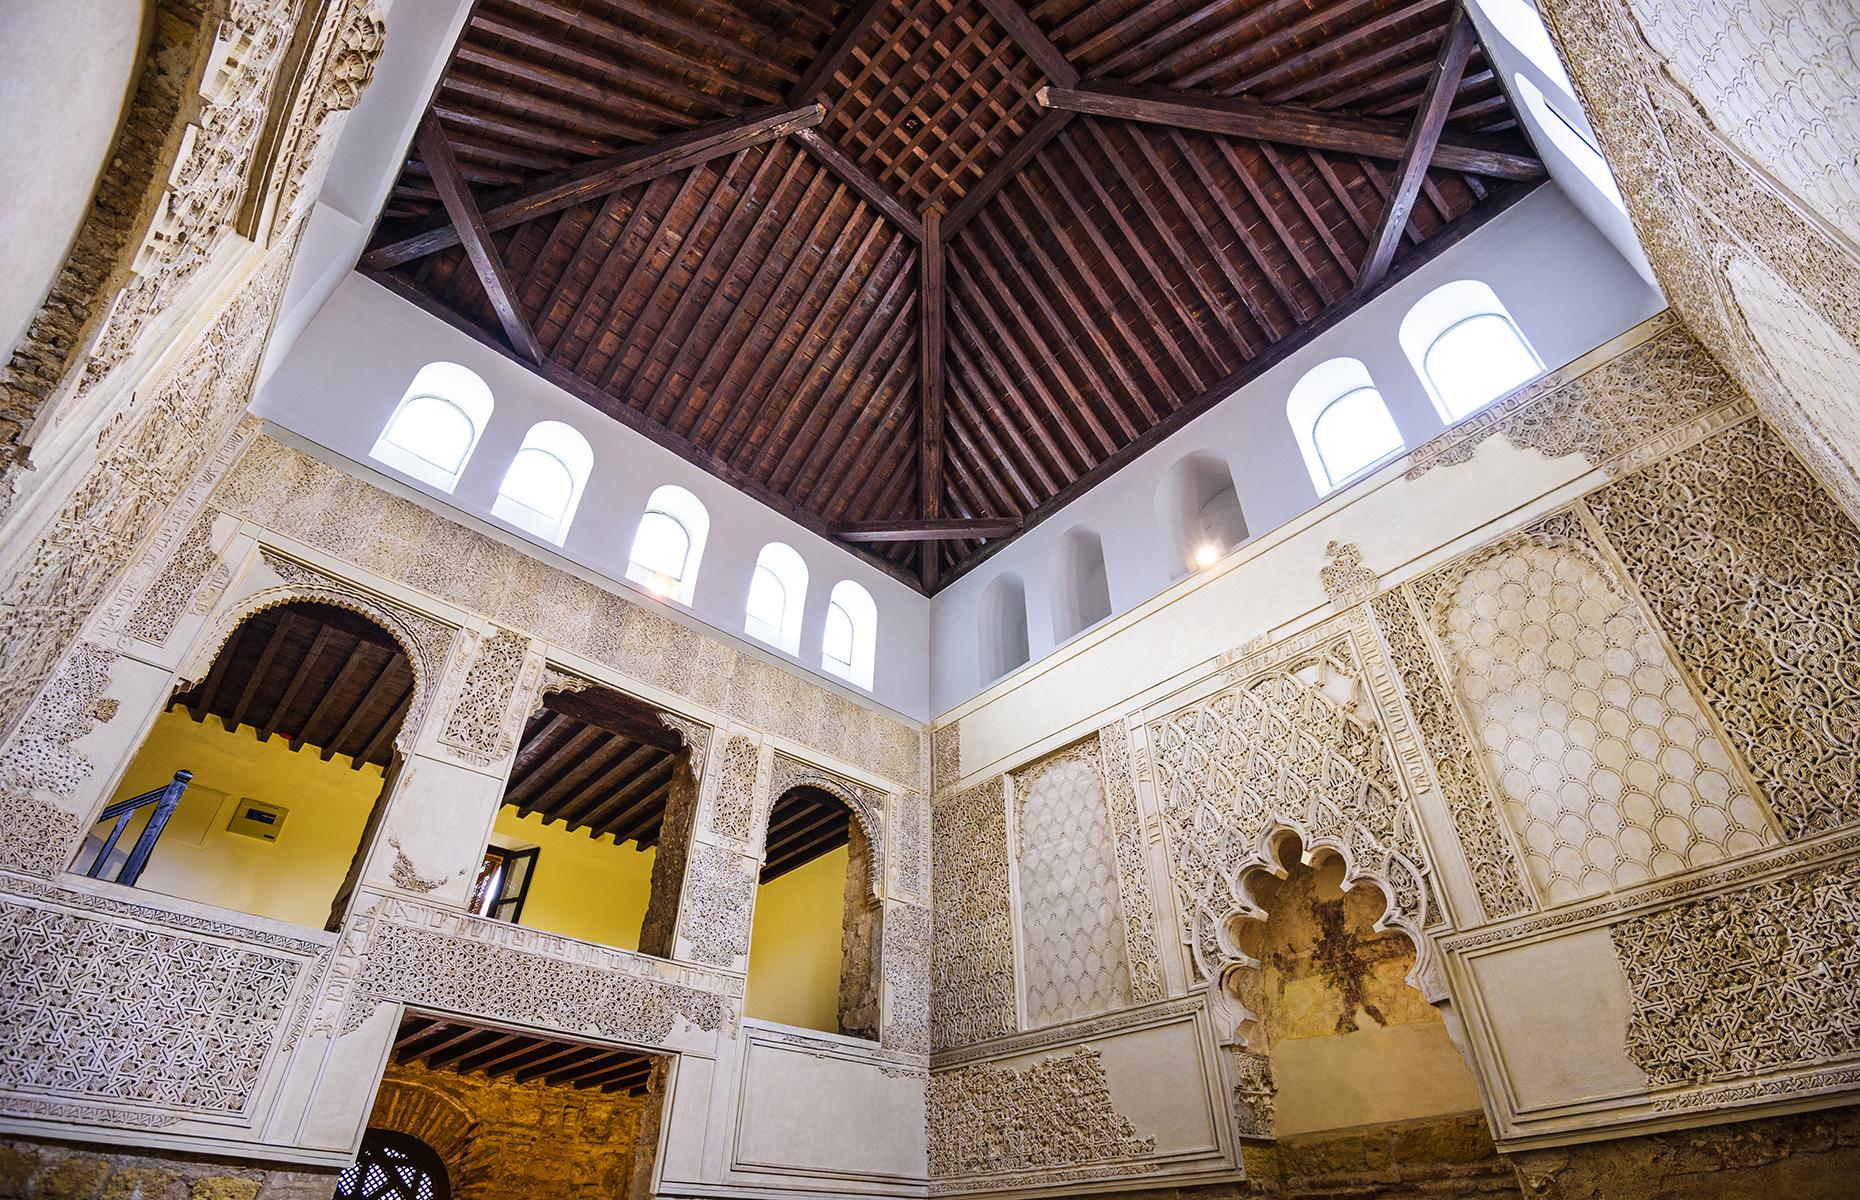 Córdoba Synagogue (Image: Sean Pavone/Shutterstock)